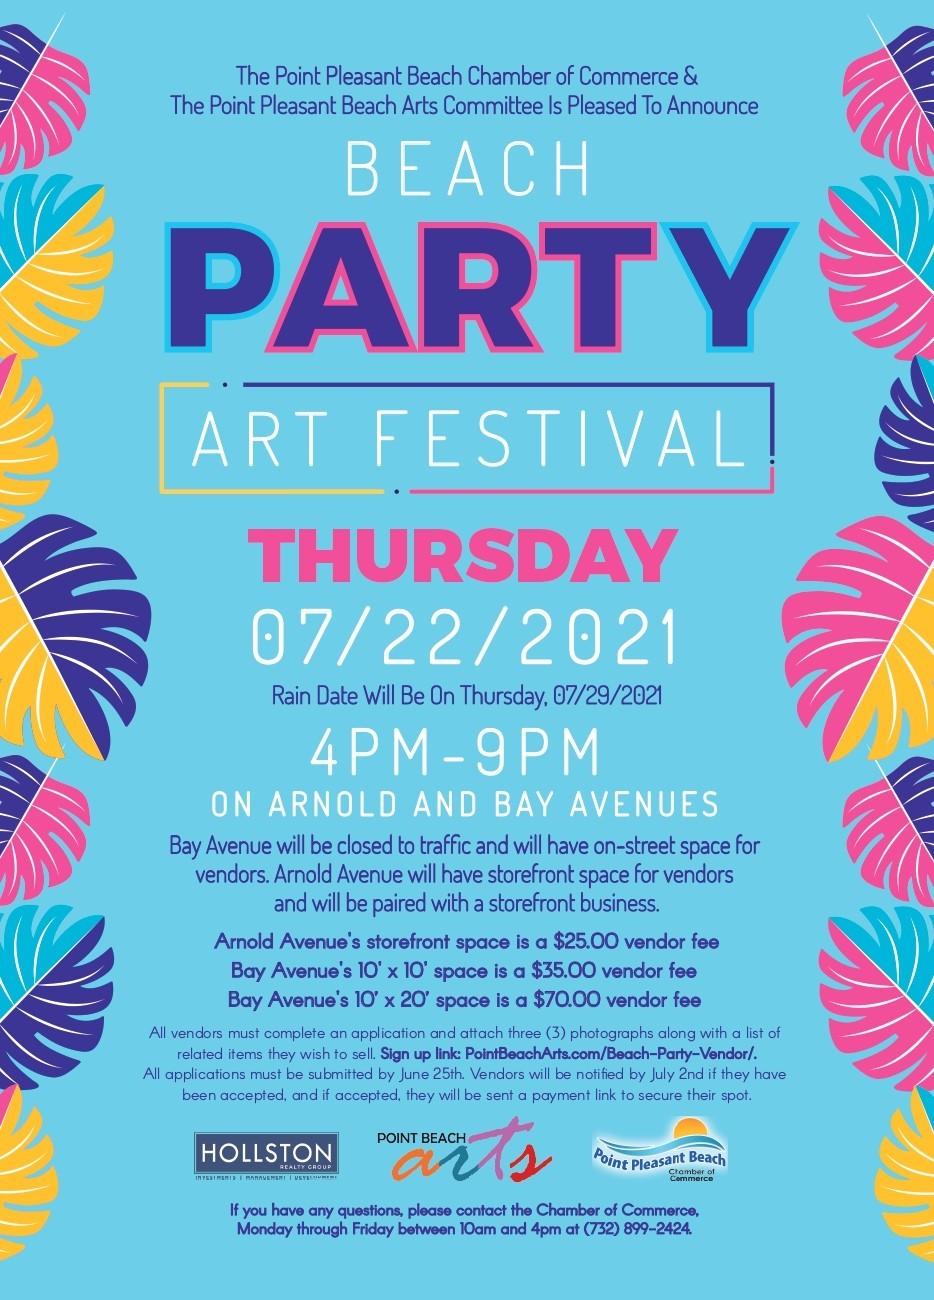 Beach Party - Art Festival @ Arnold Ave & Bay Ave